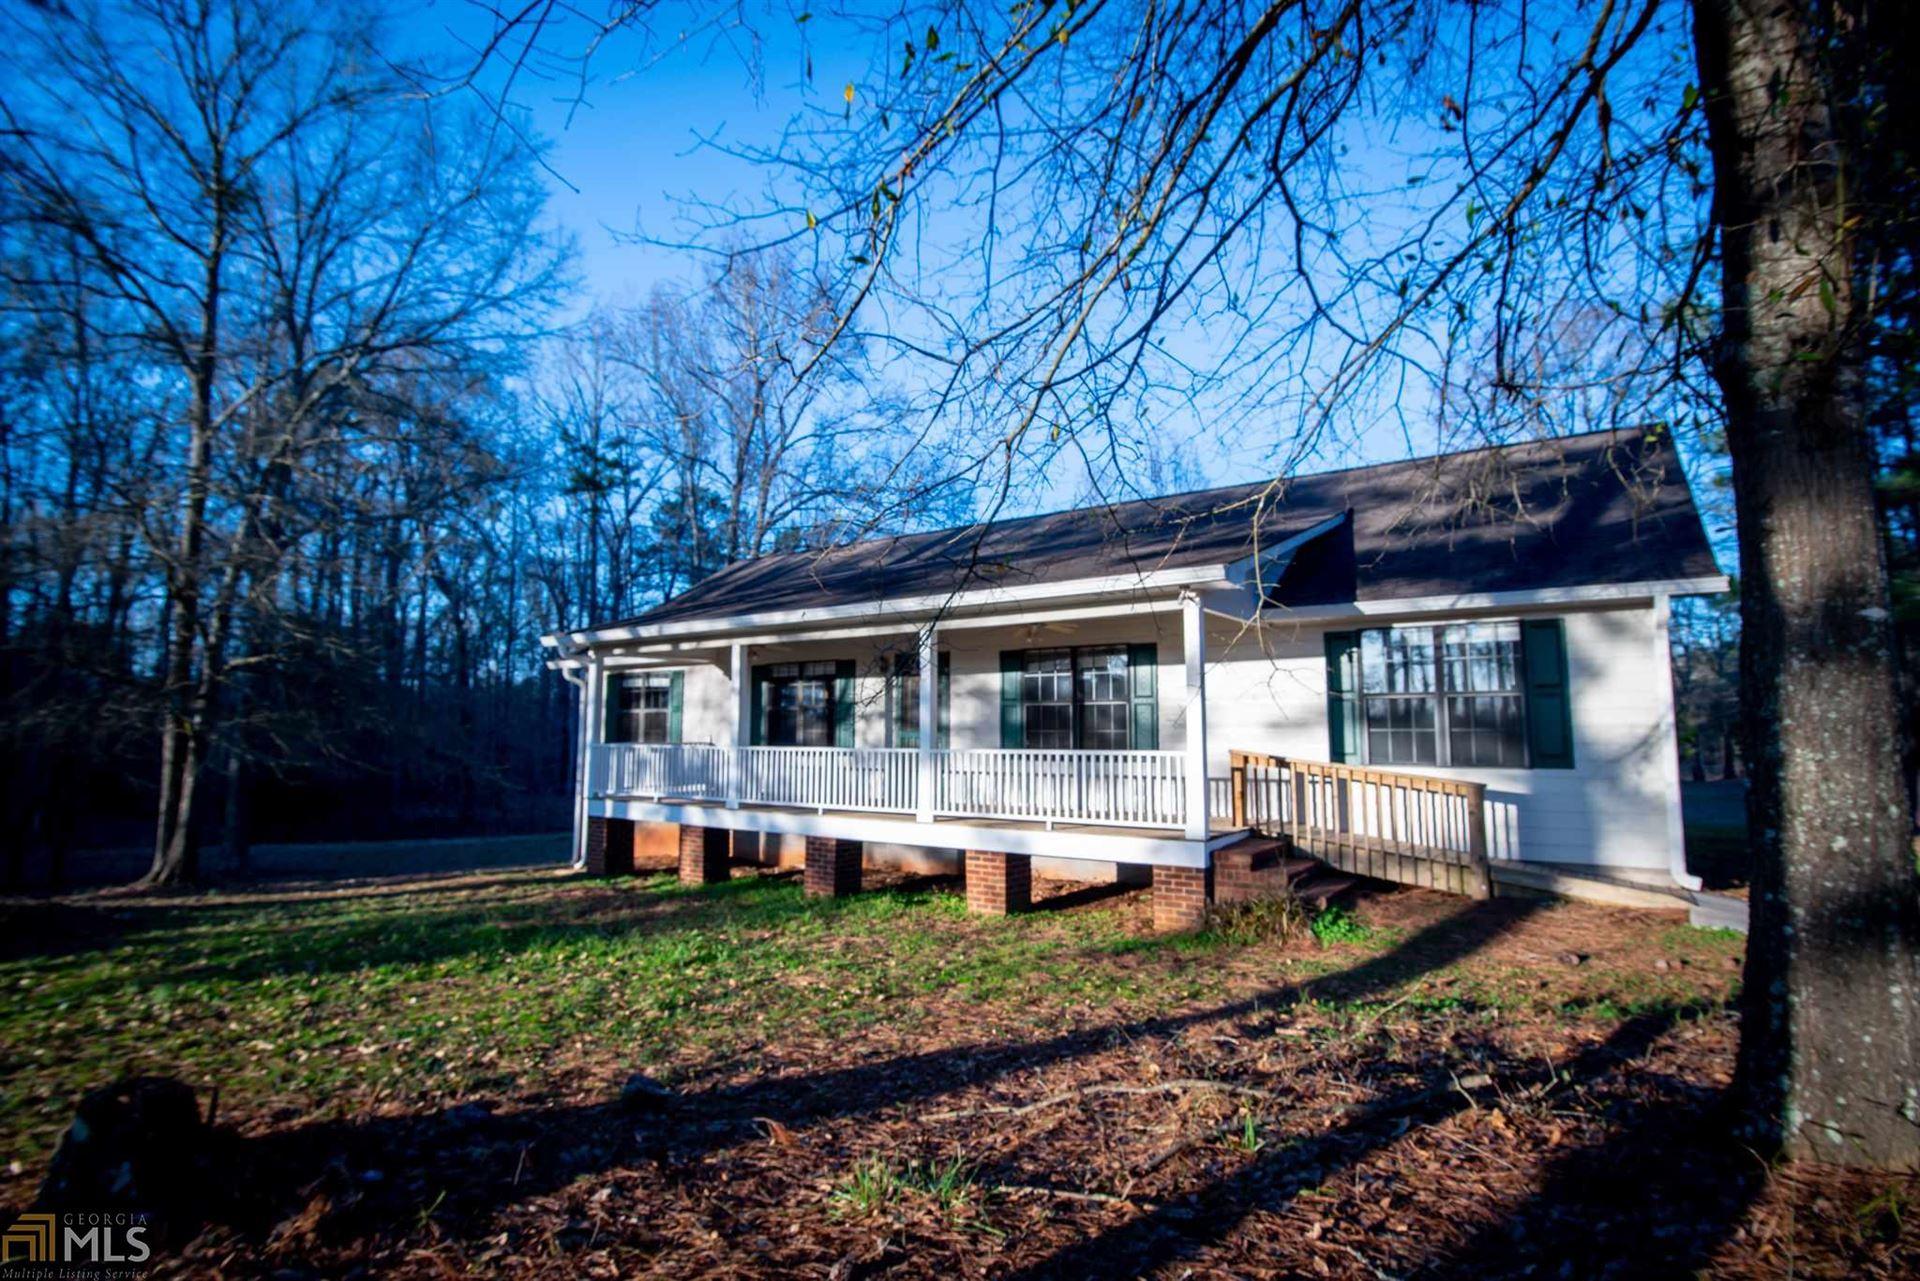 1969 Apt To Miss Rd, Monticello, GA 31064 - MLS#: 8934399